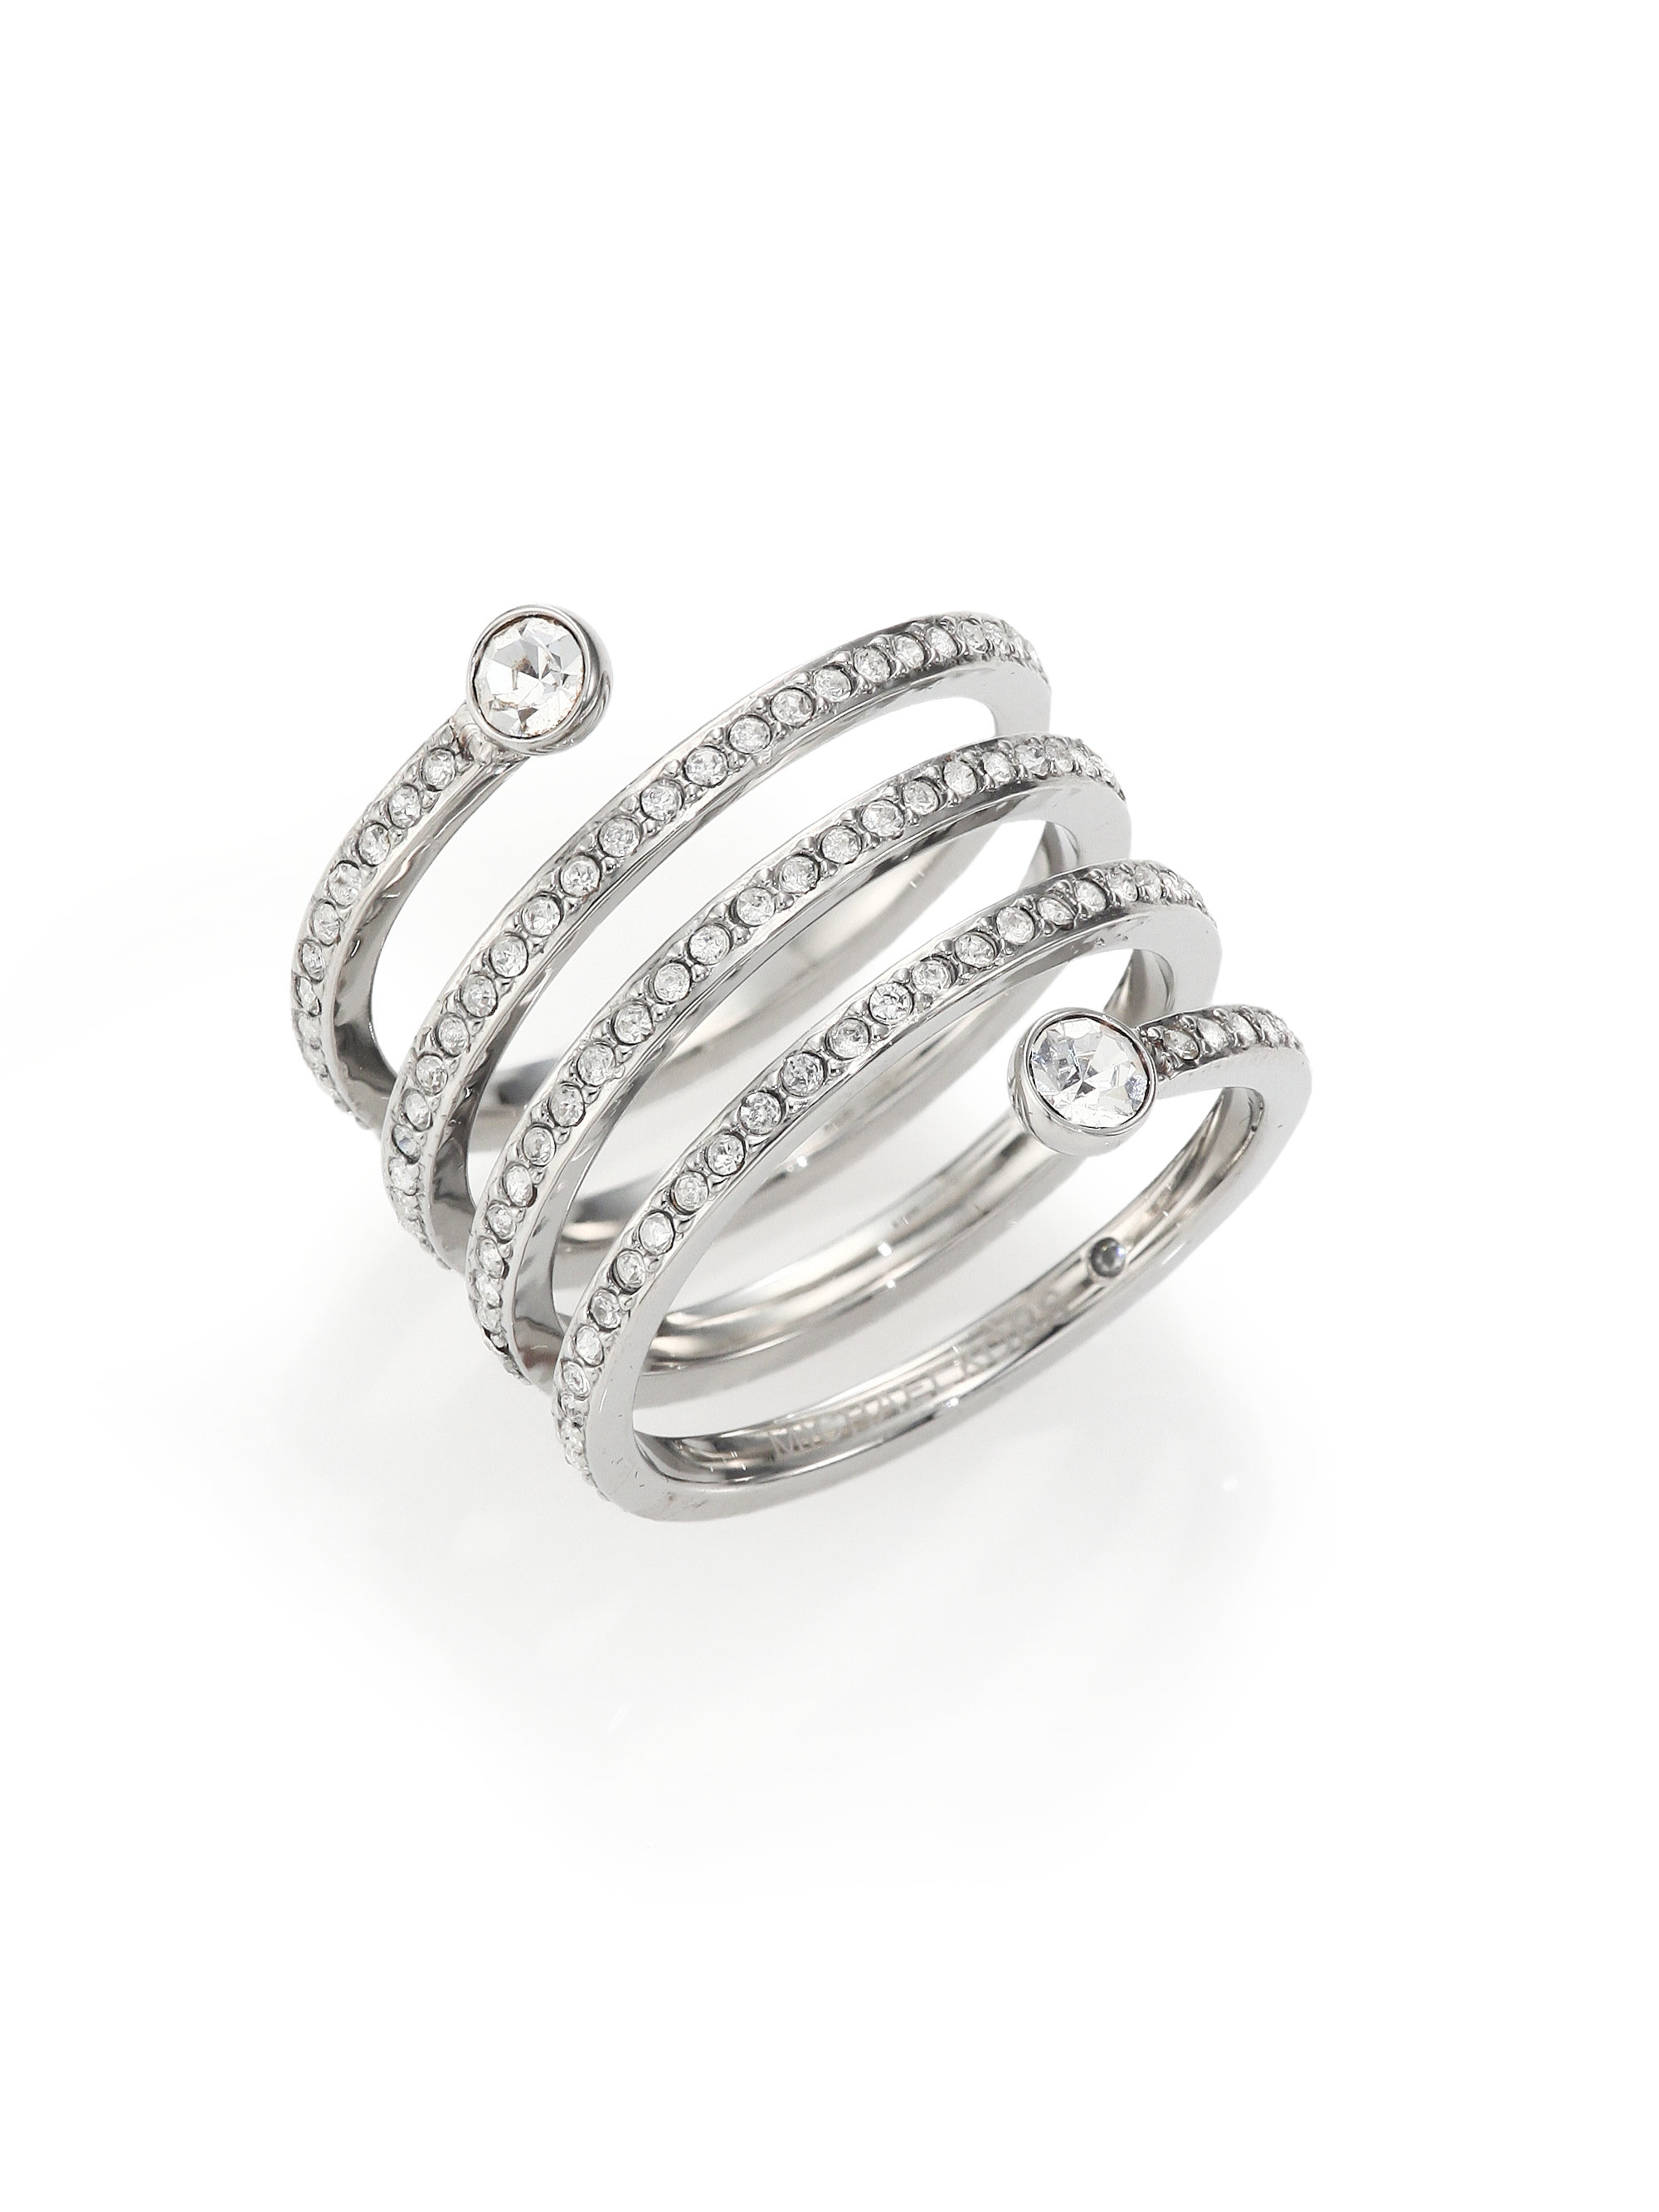 7f2cf26de5fd Lyst - Michael Kors Park Avenue Glam Pave Spiral Ring silvertone in ...